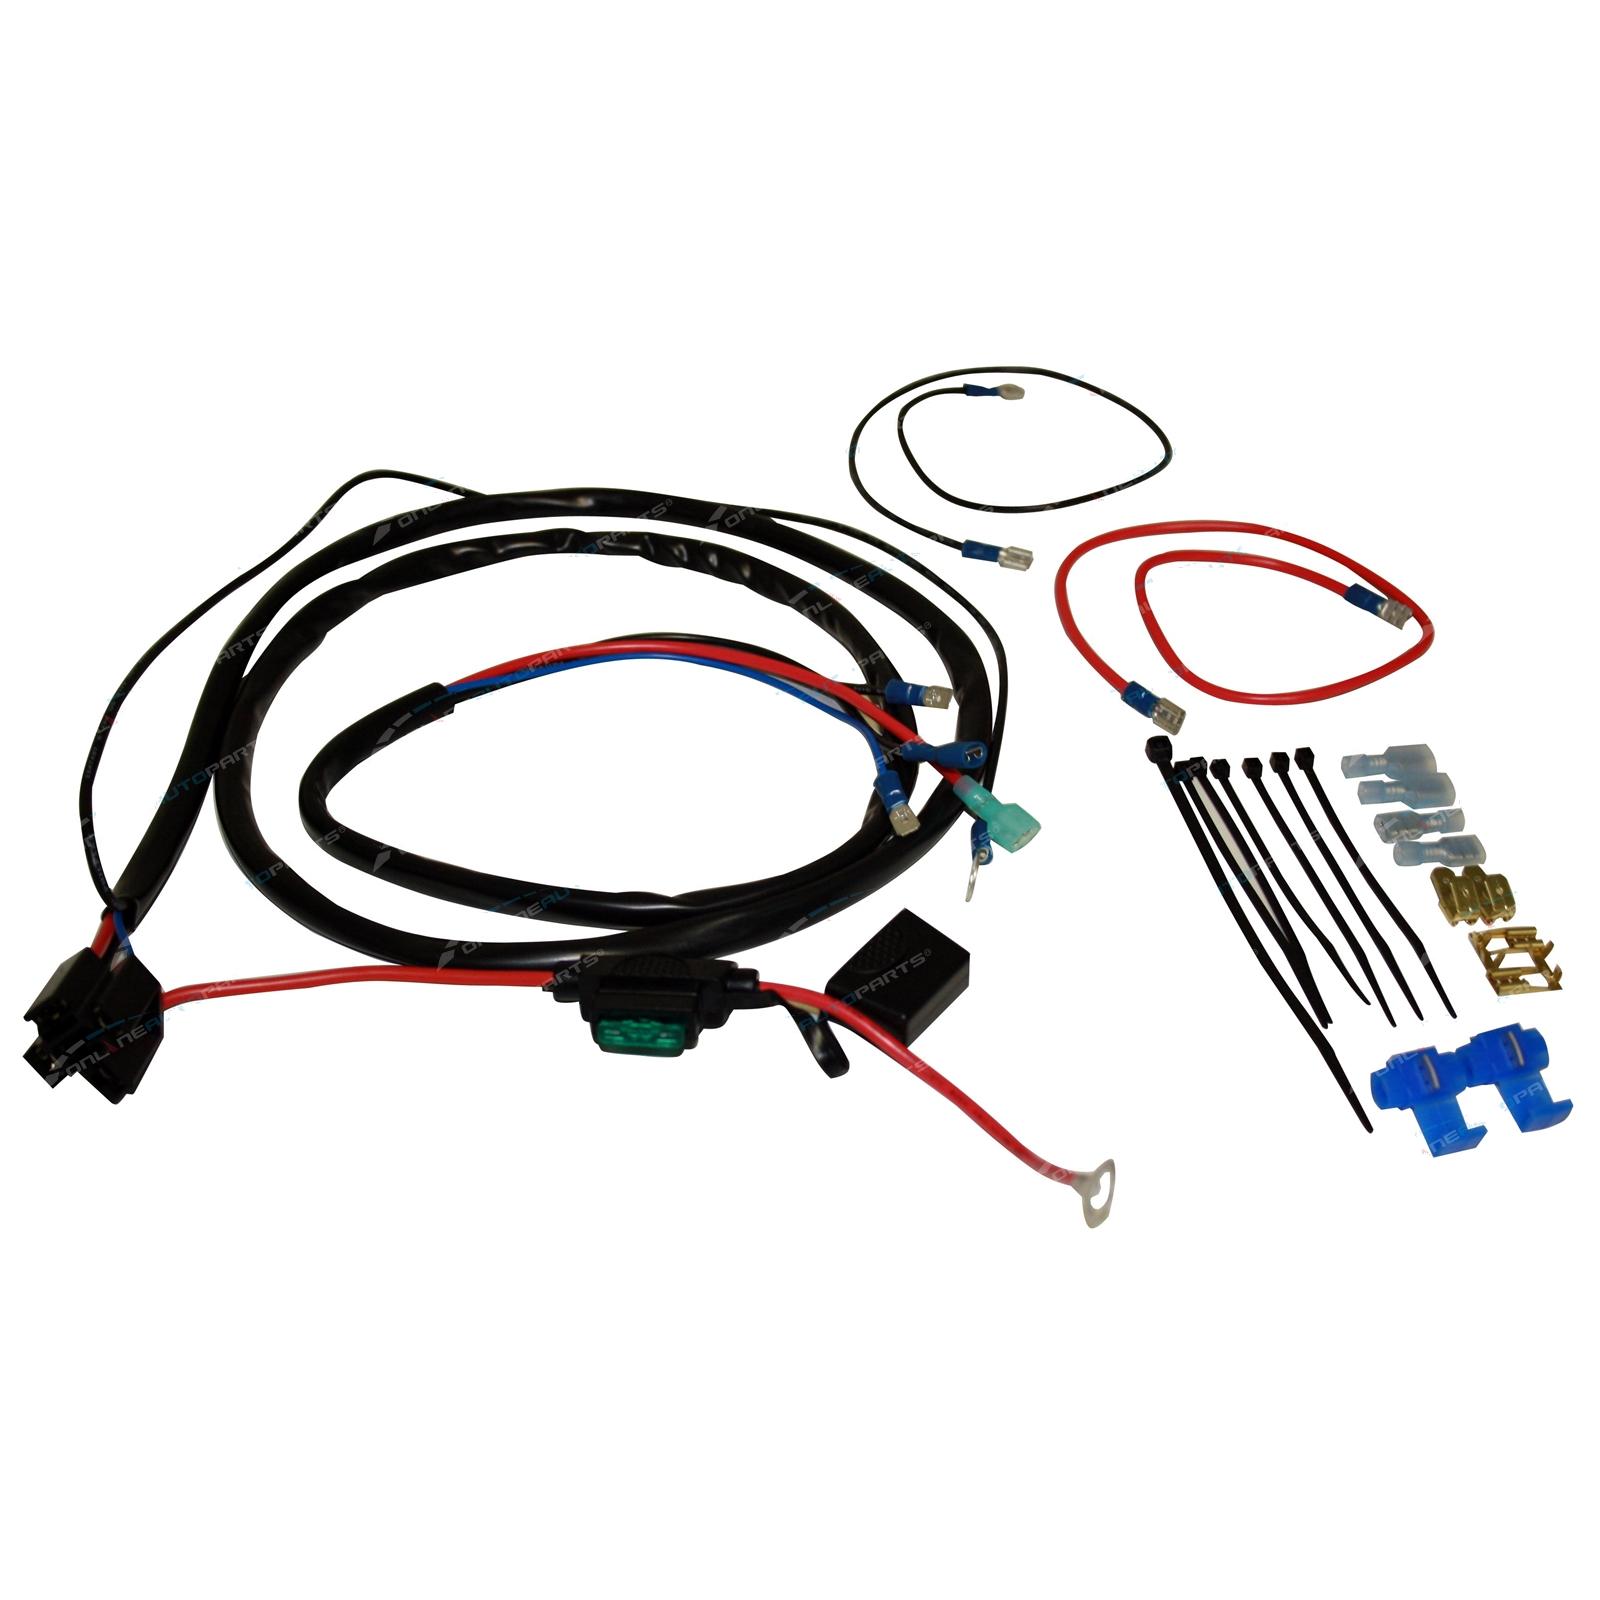 136db high power stebel magnum twin electric horn wiring harness car bike loud